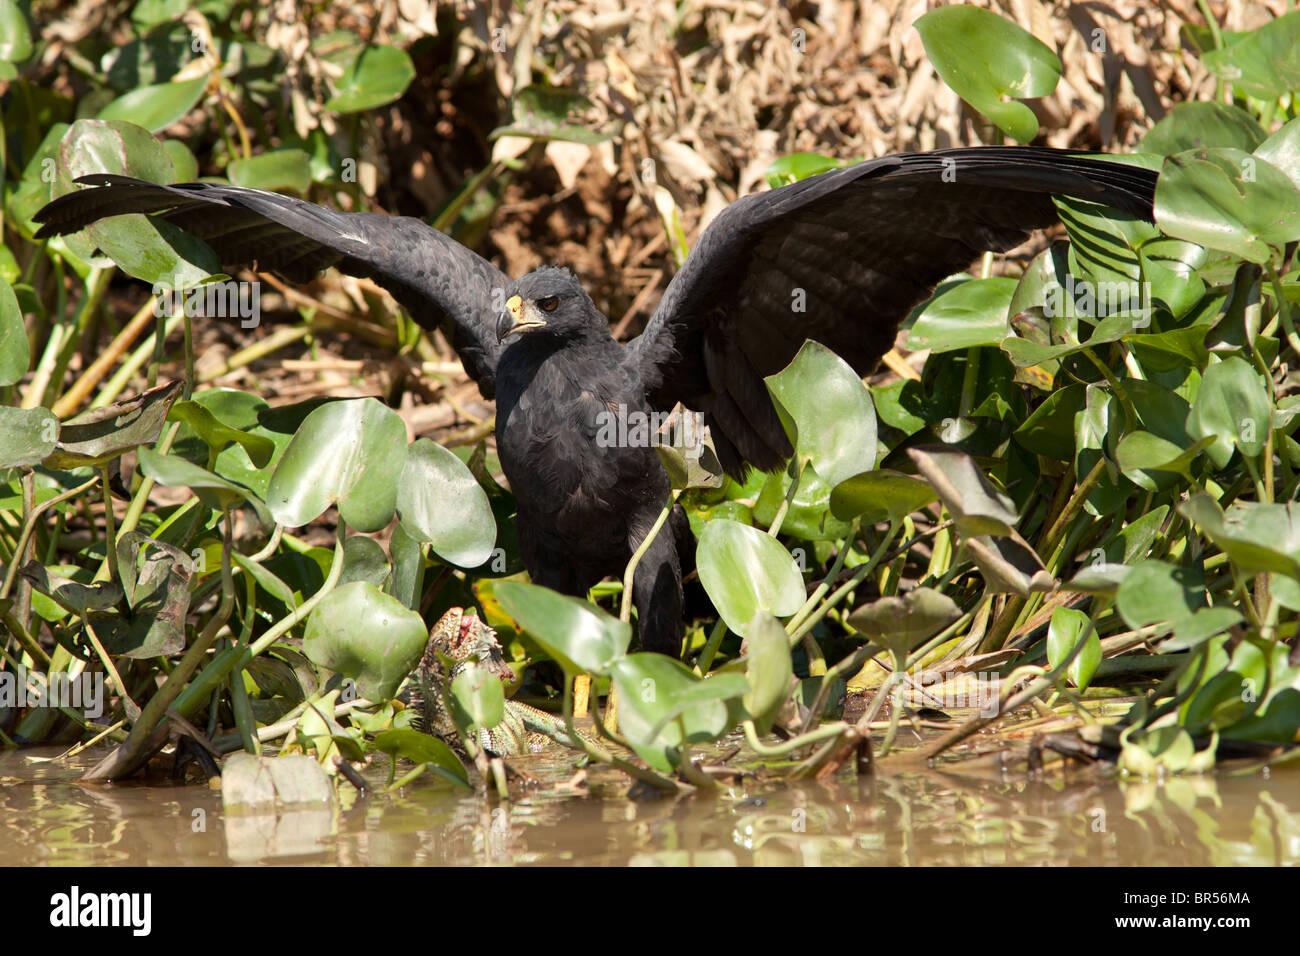 Great Black Hawk with Iguana Victim - Stock Image